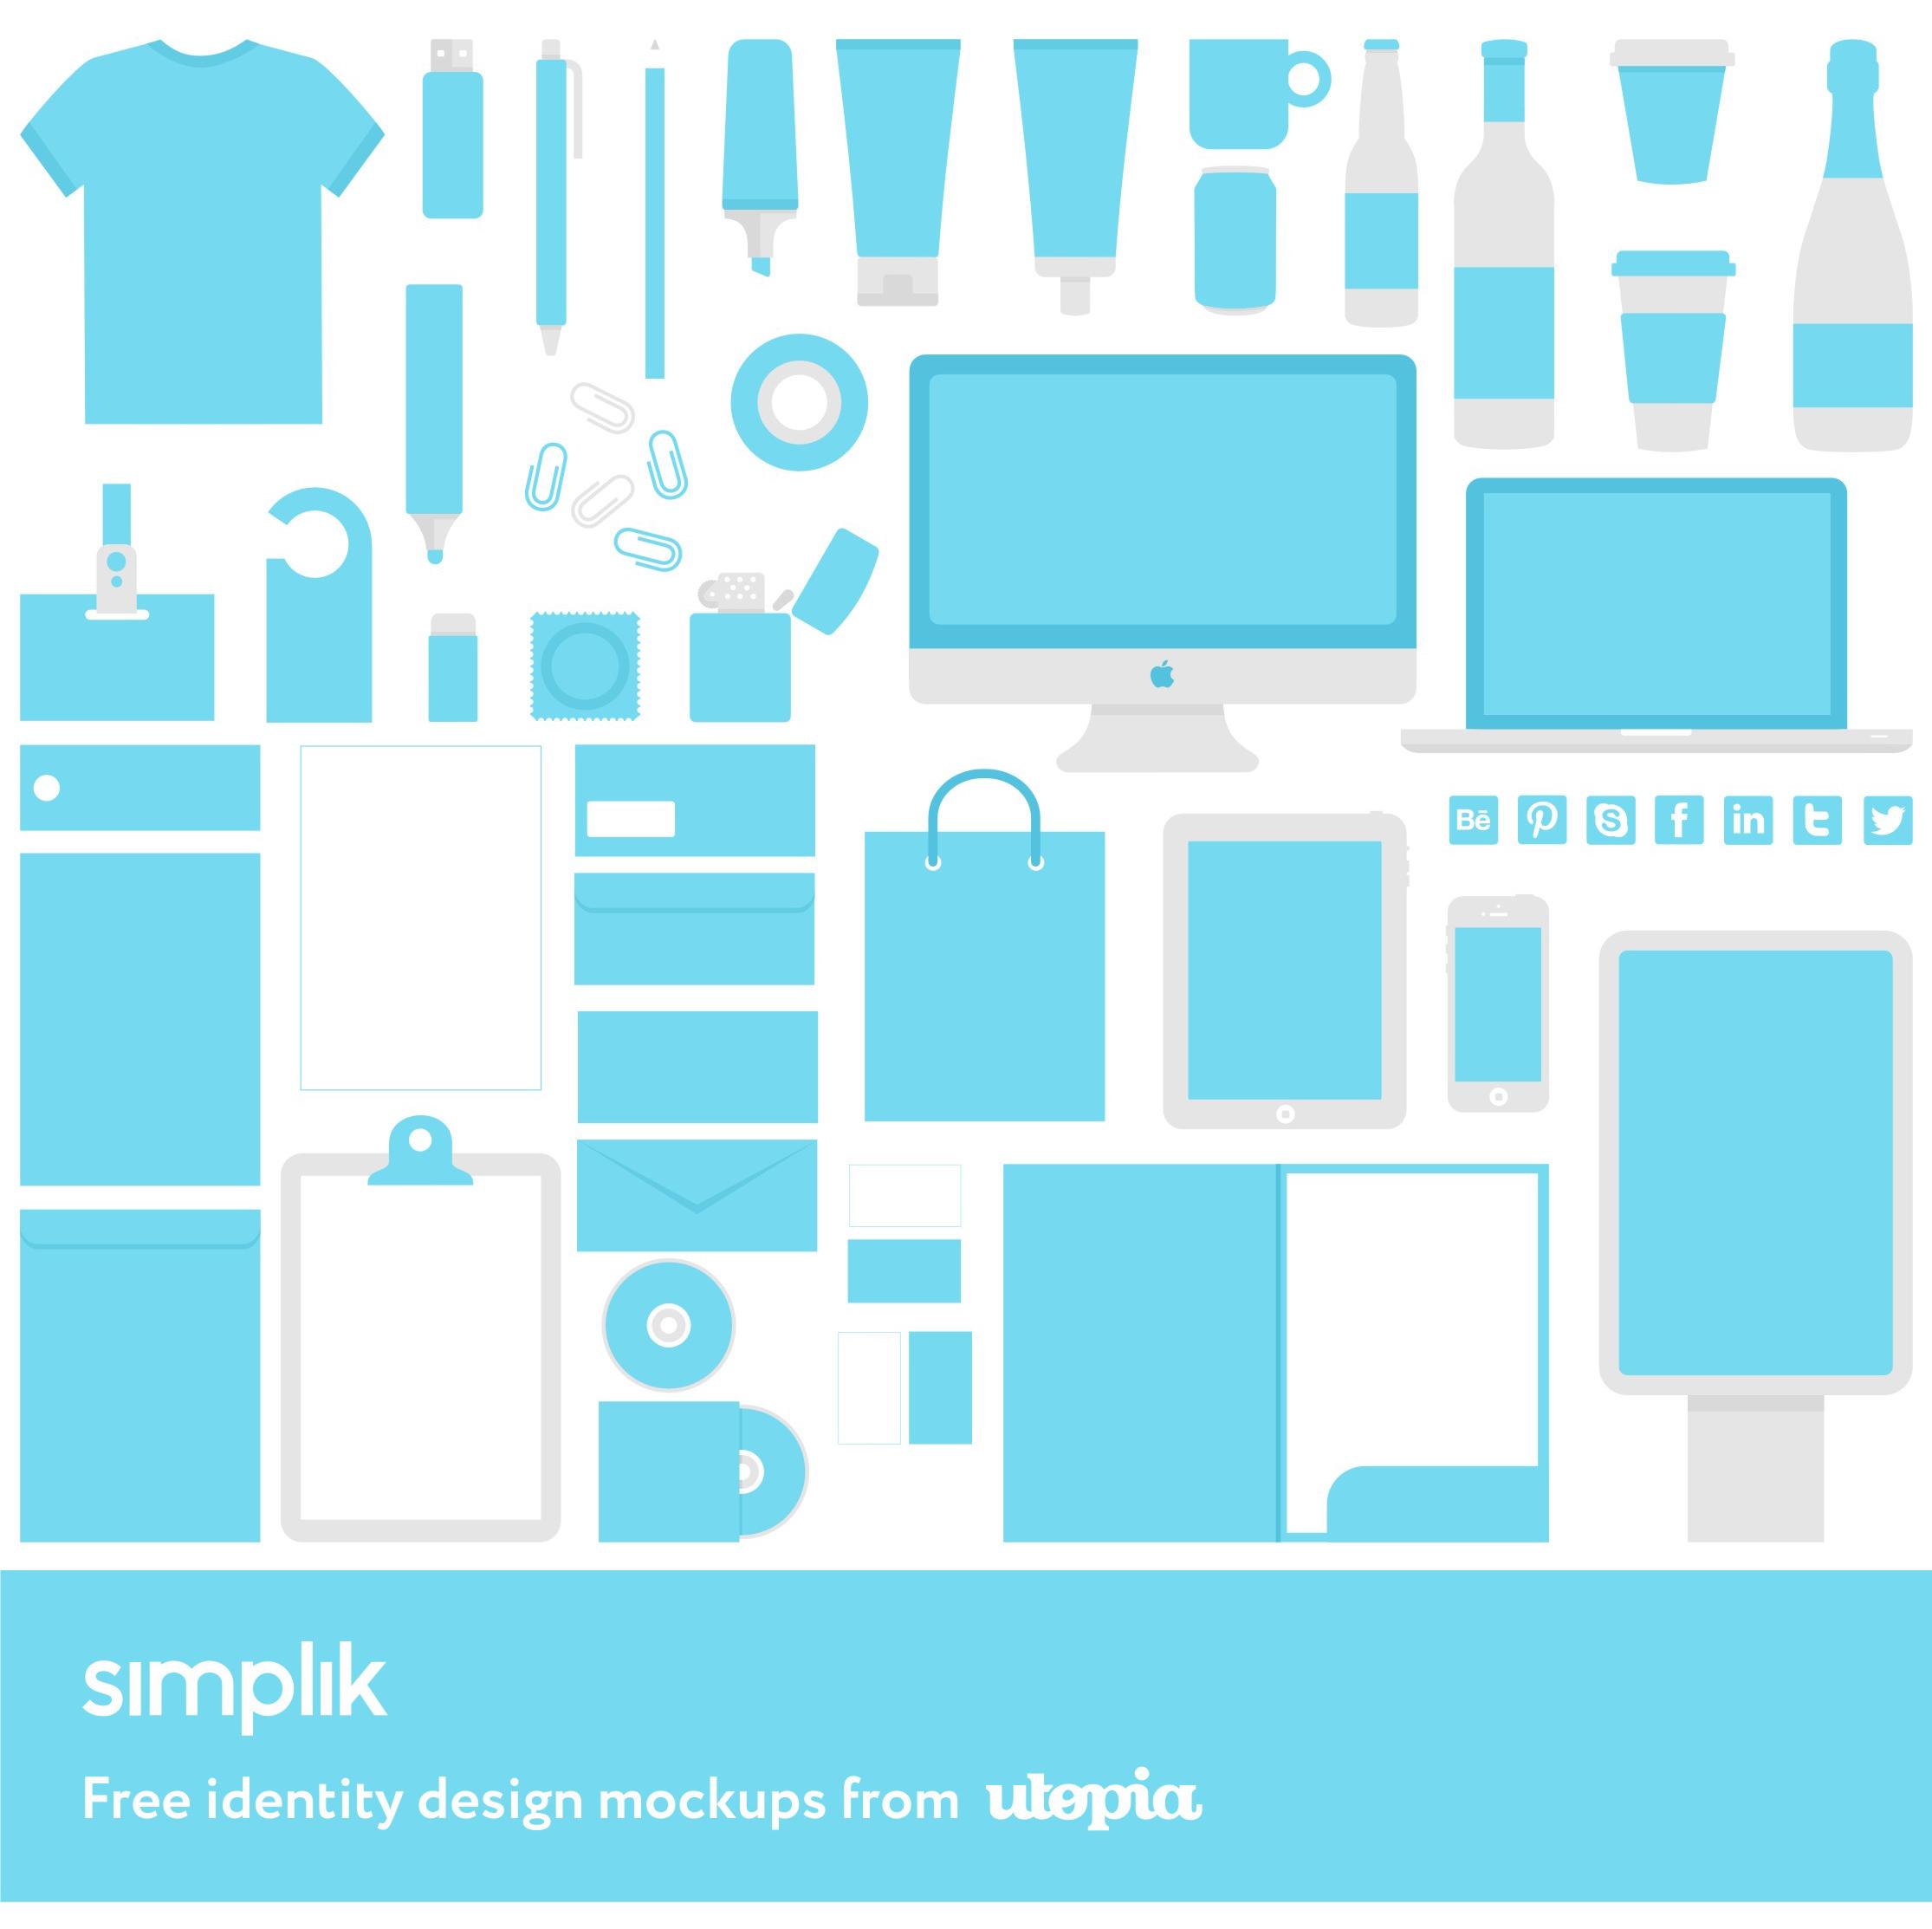 Simplik, full corporate identity design mockups freebie giveaway from Utopia branding agency